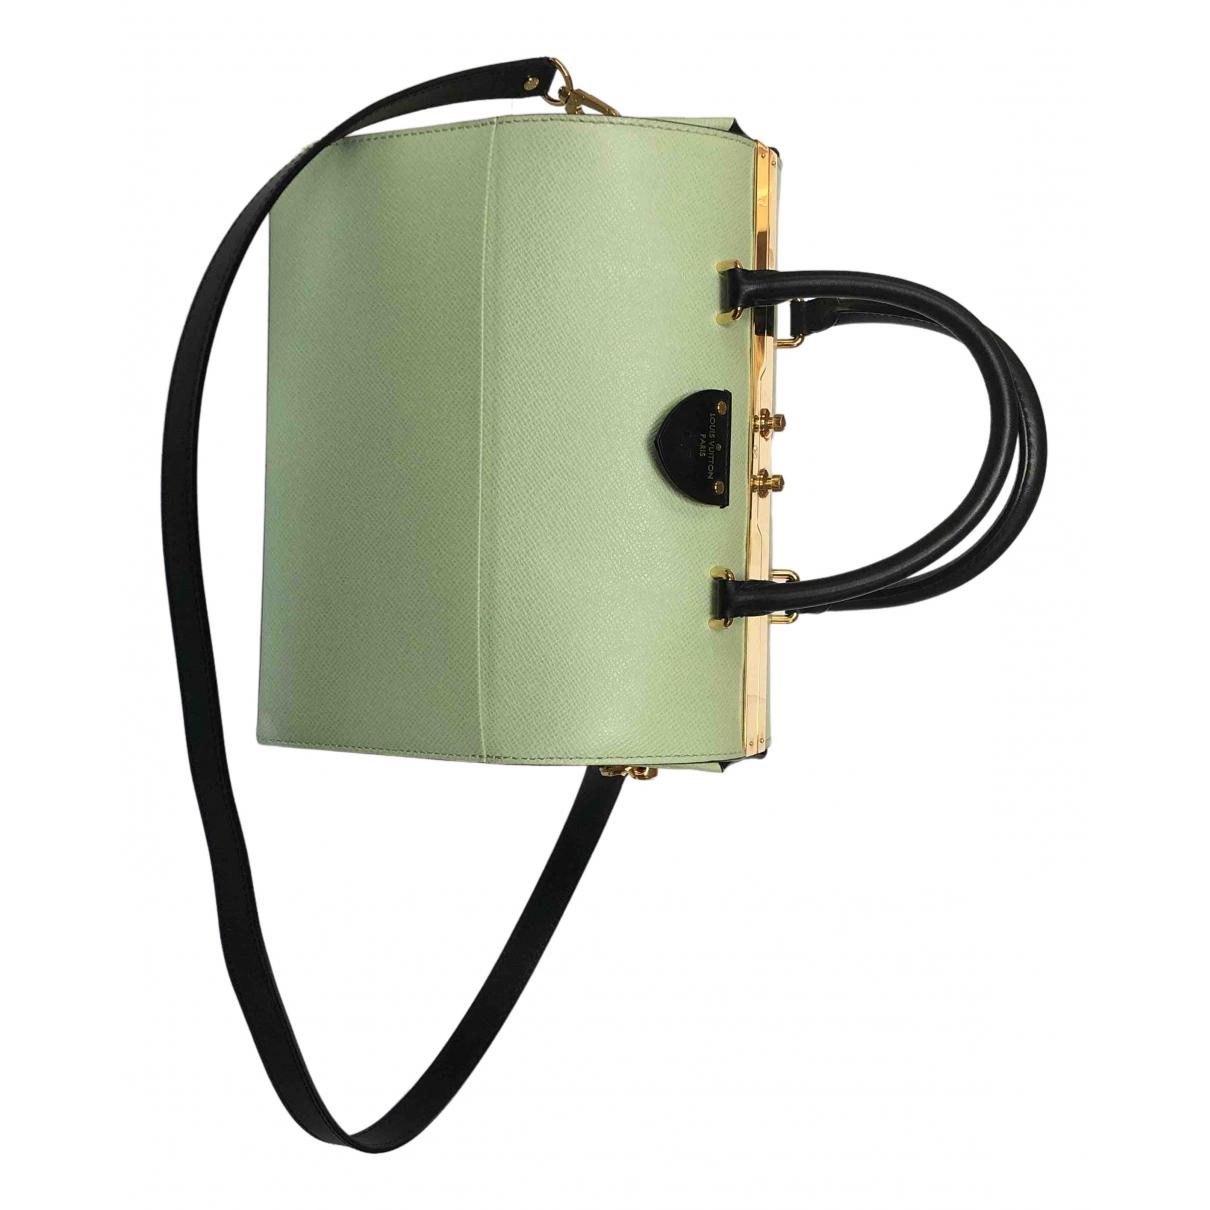 Louis Vuitton - Sac a main Speedy Doctor 25 pour femme en cuir - vert